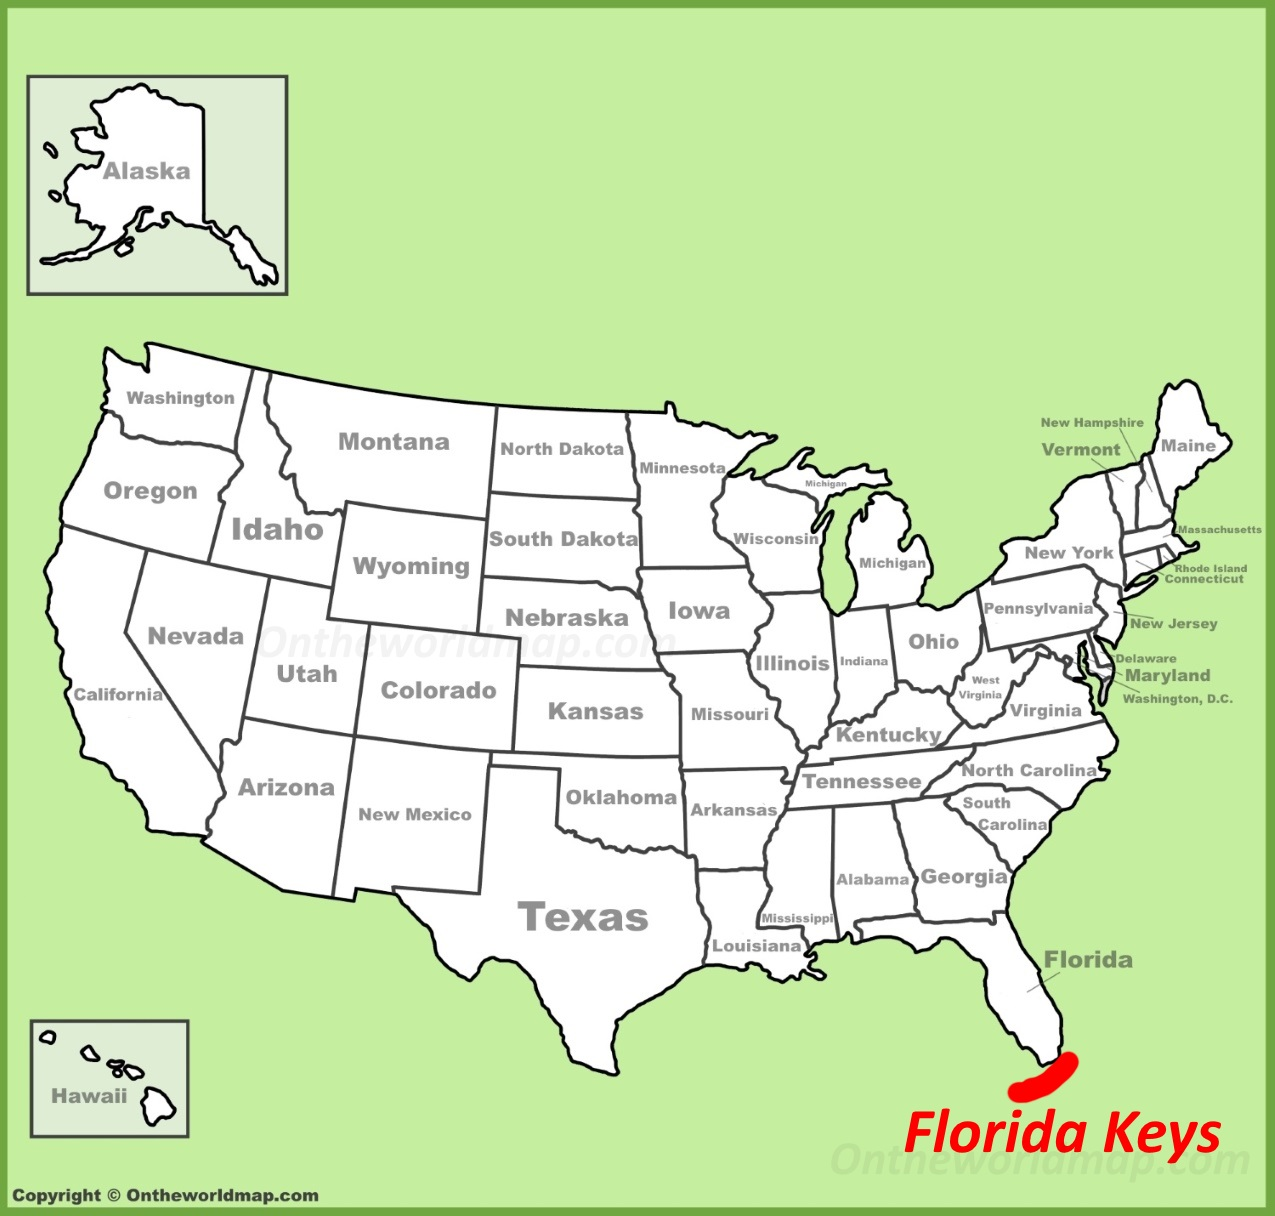 Florida On The Us Map Florida Keys location on the U.S. Map